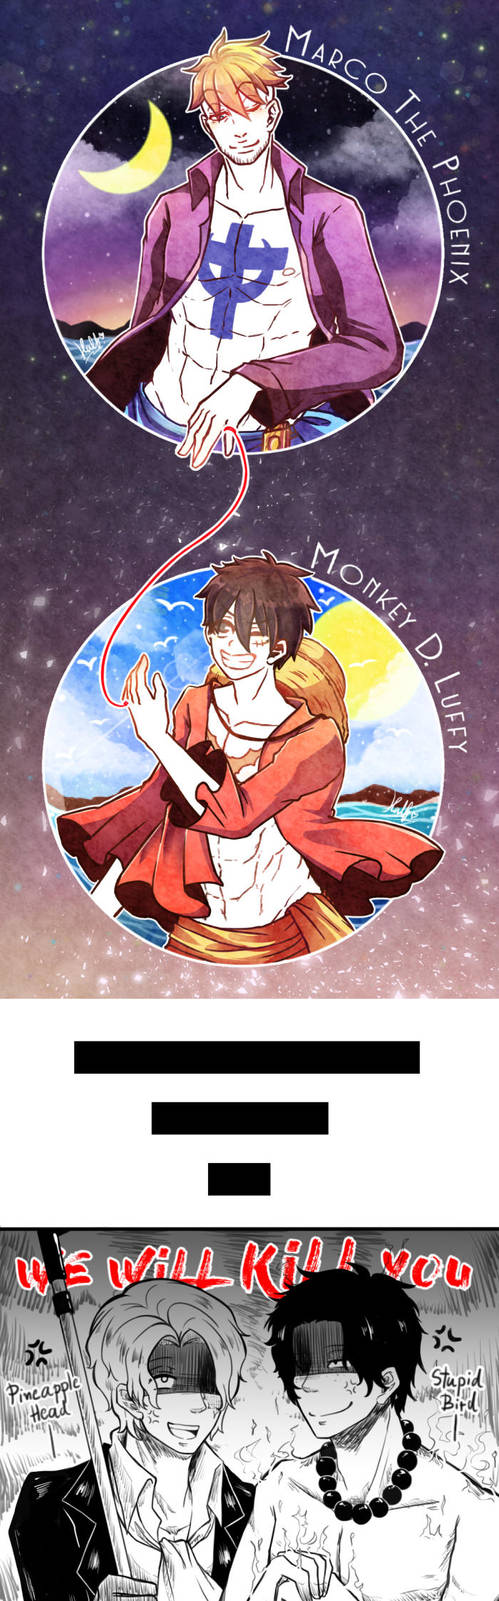 [FanArt] One Piece : MarLu Unmei no akai ito by HalfChe